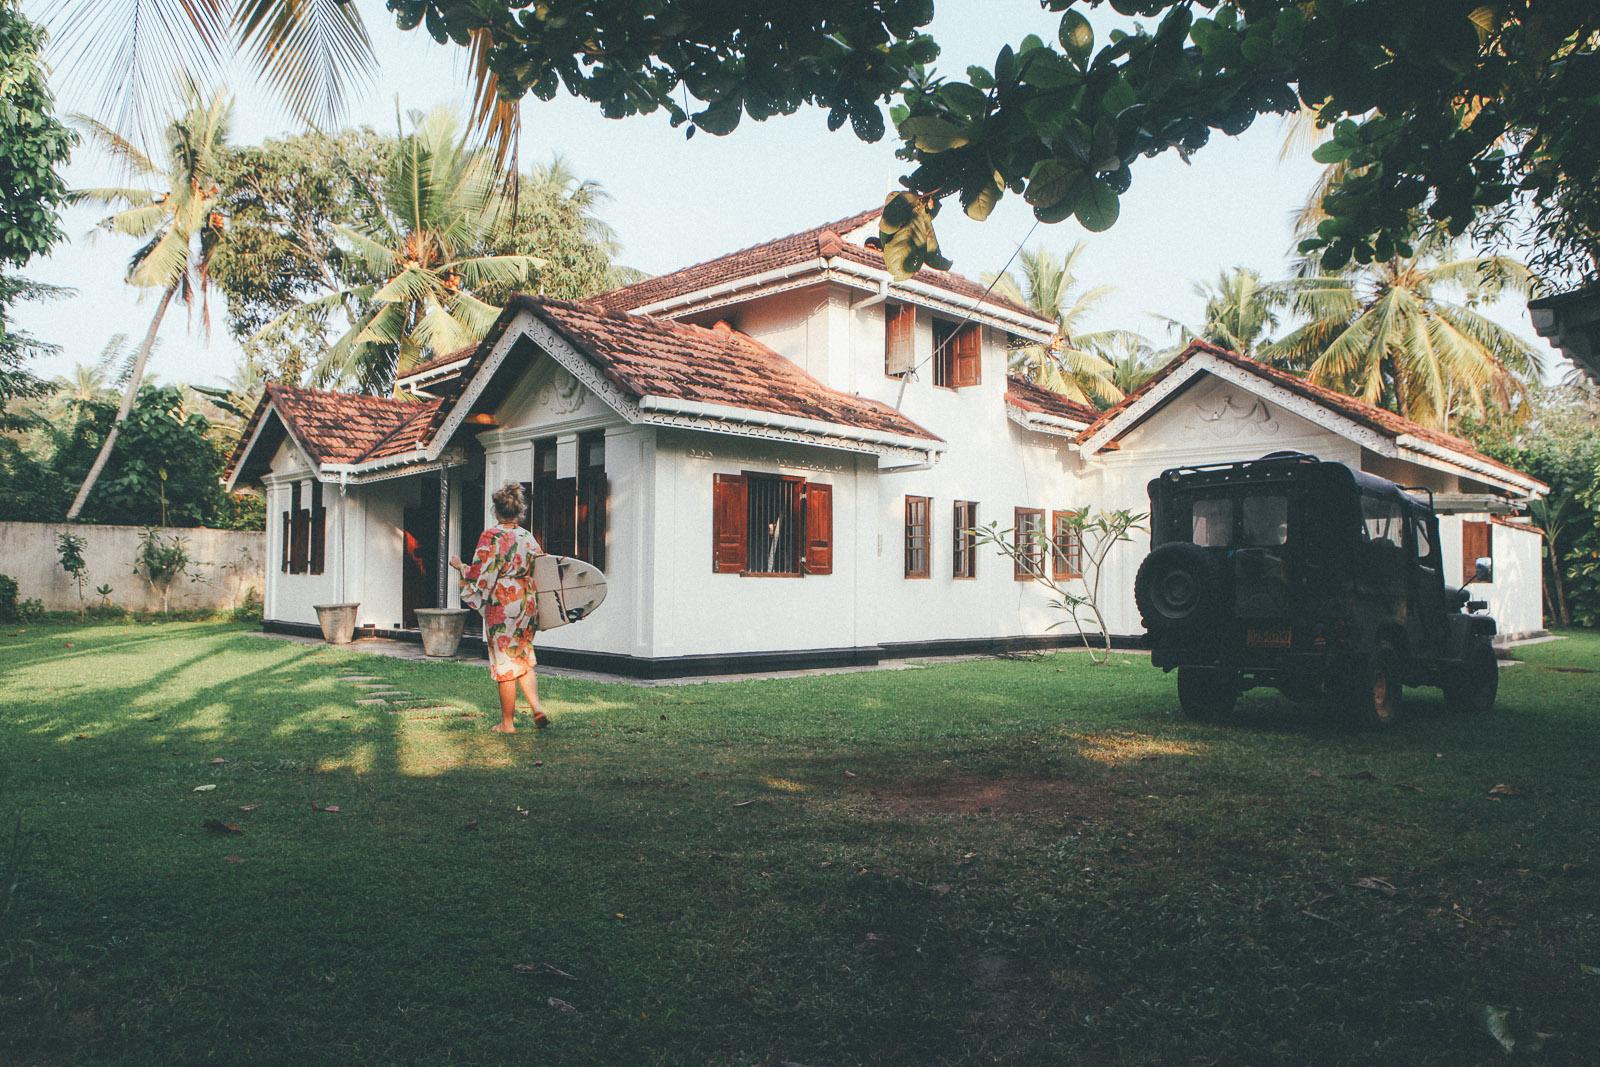 Sri-Lanka-Hikkaduwa-Midigama-Aragum-Bay-Sunshinestories-surf-travel-blog-IMG_7169.jpg